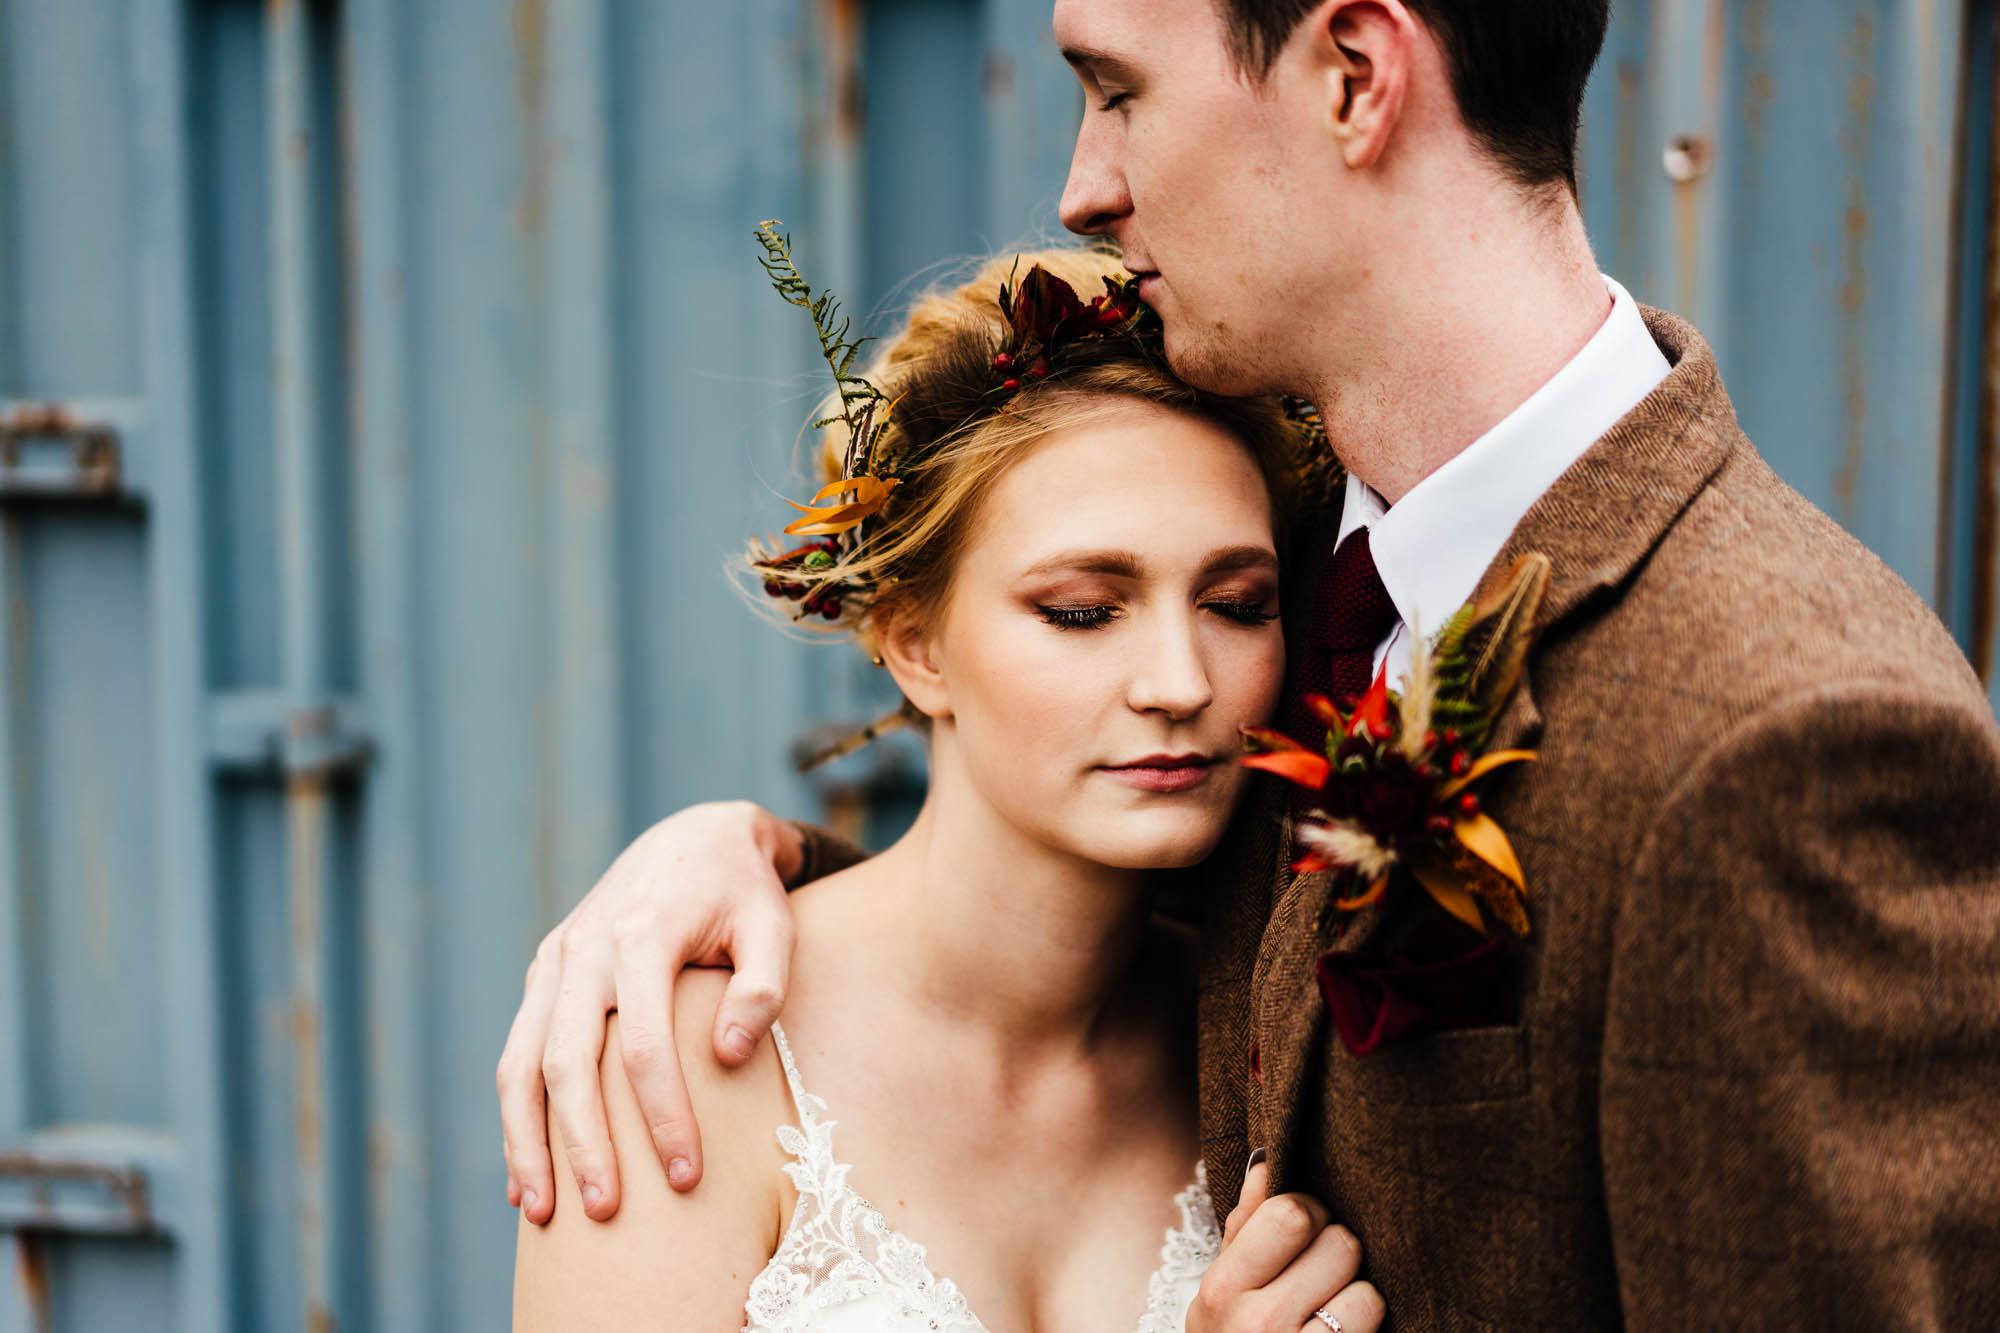 huntsmill-farm-wedding-inspiration-16